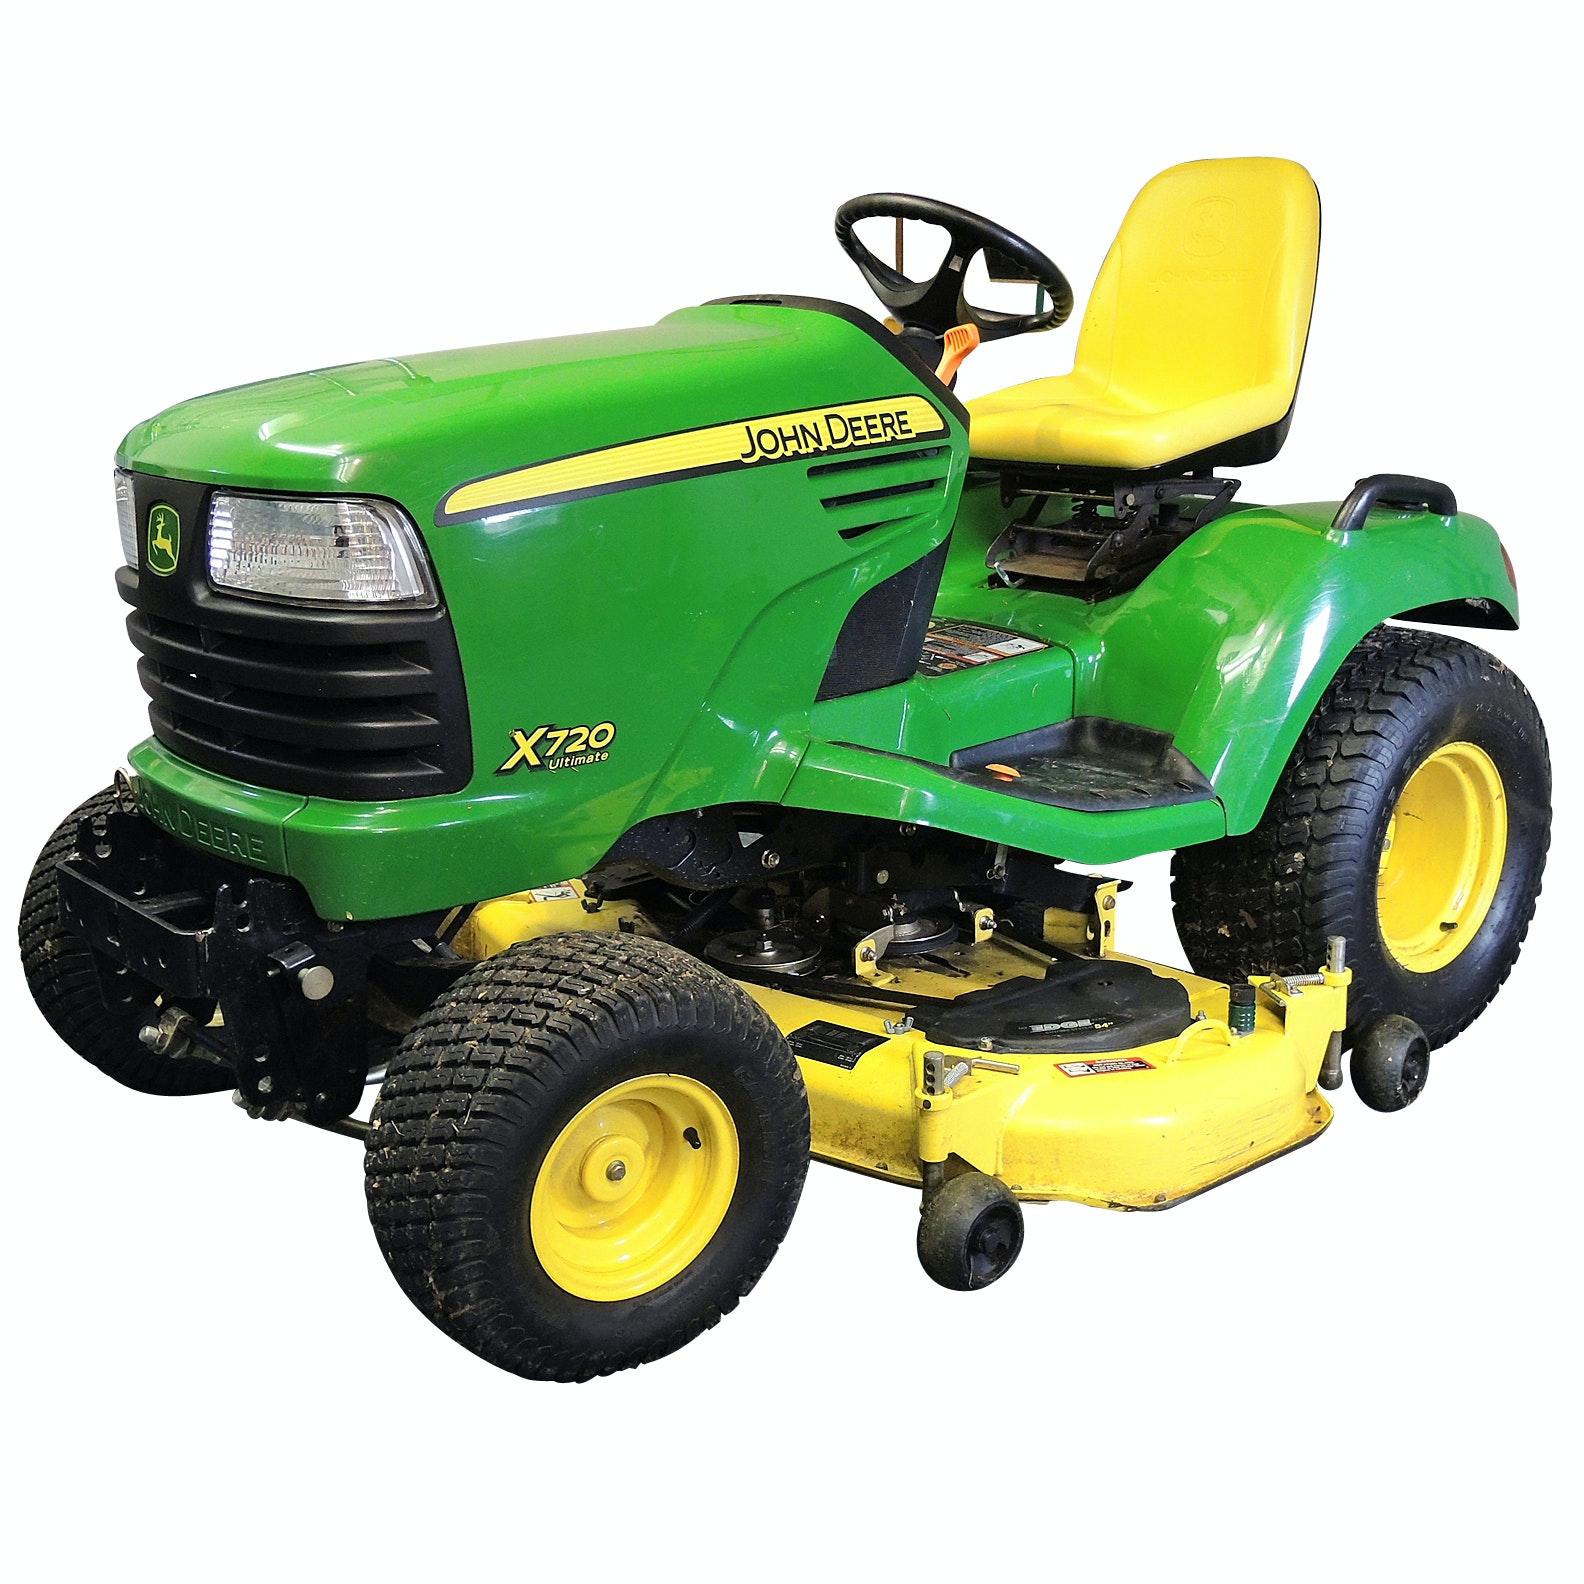 John Deere X720 Riding Tractor Mower